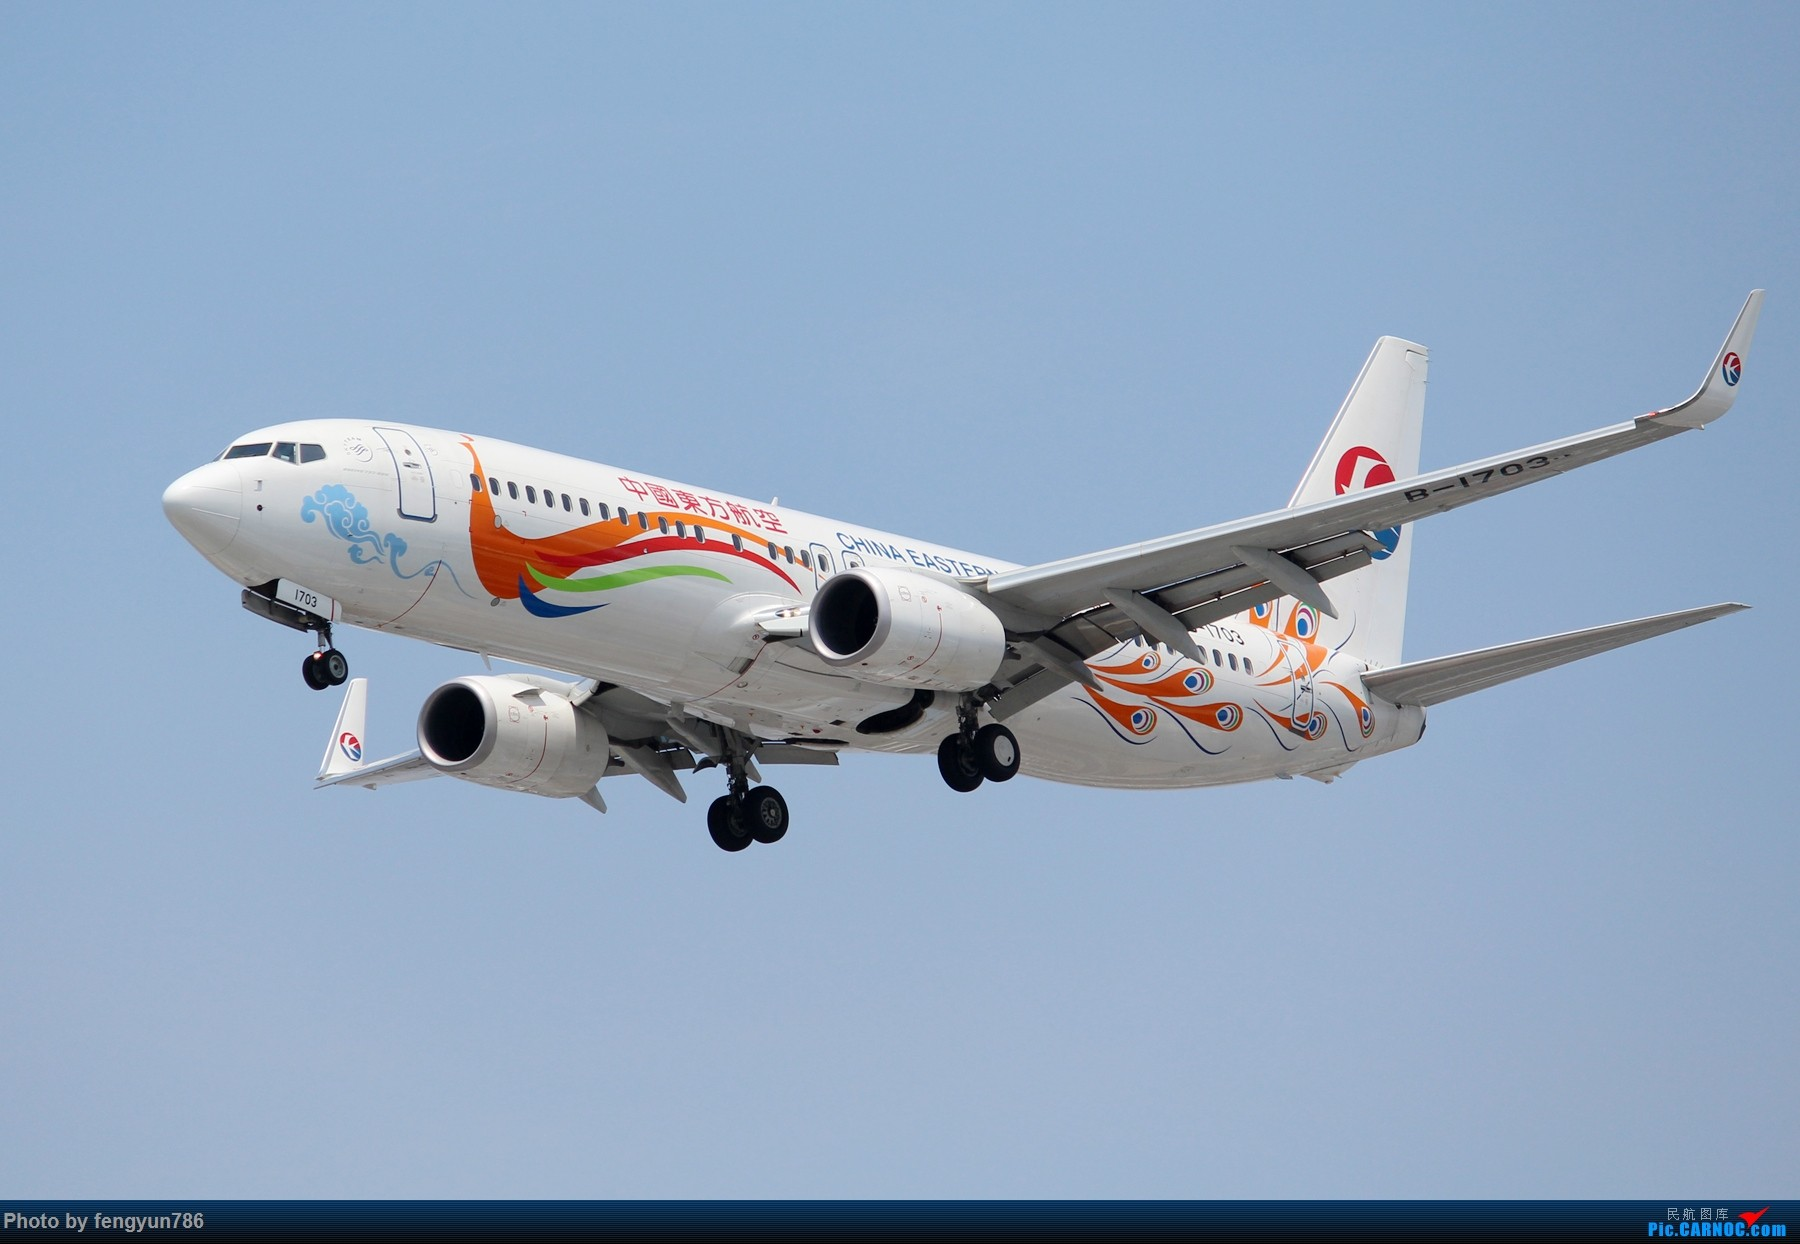 Re:[原创]7.19的SHA,天晴温高,发几个跟前一天不一样的。 BOEING 737-800 B-1703 中国上海虹桥国际机场